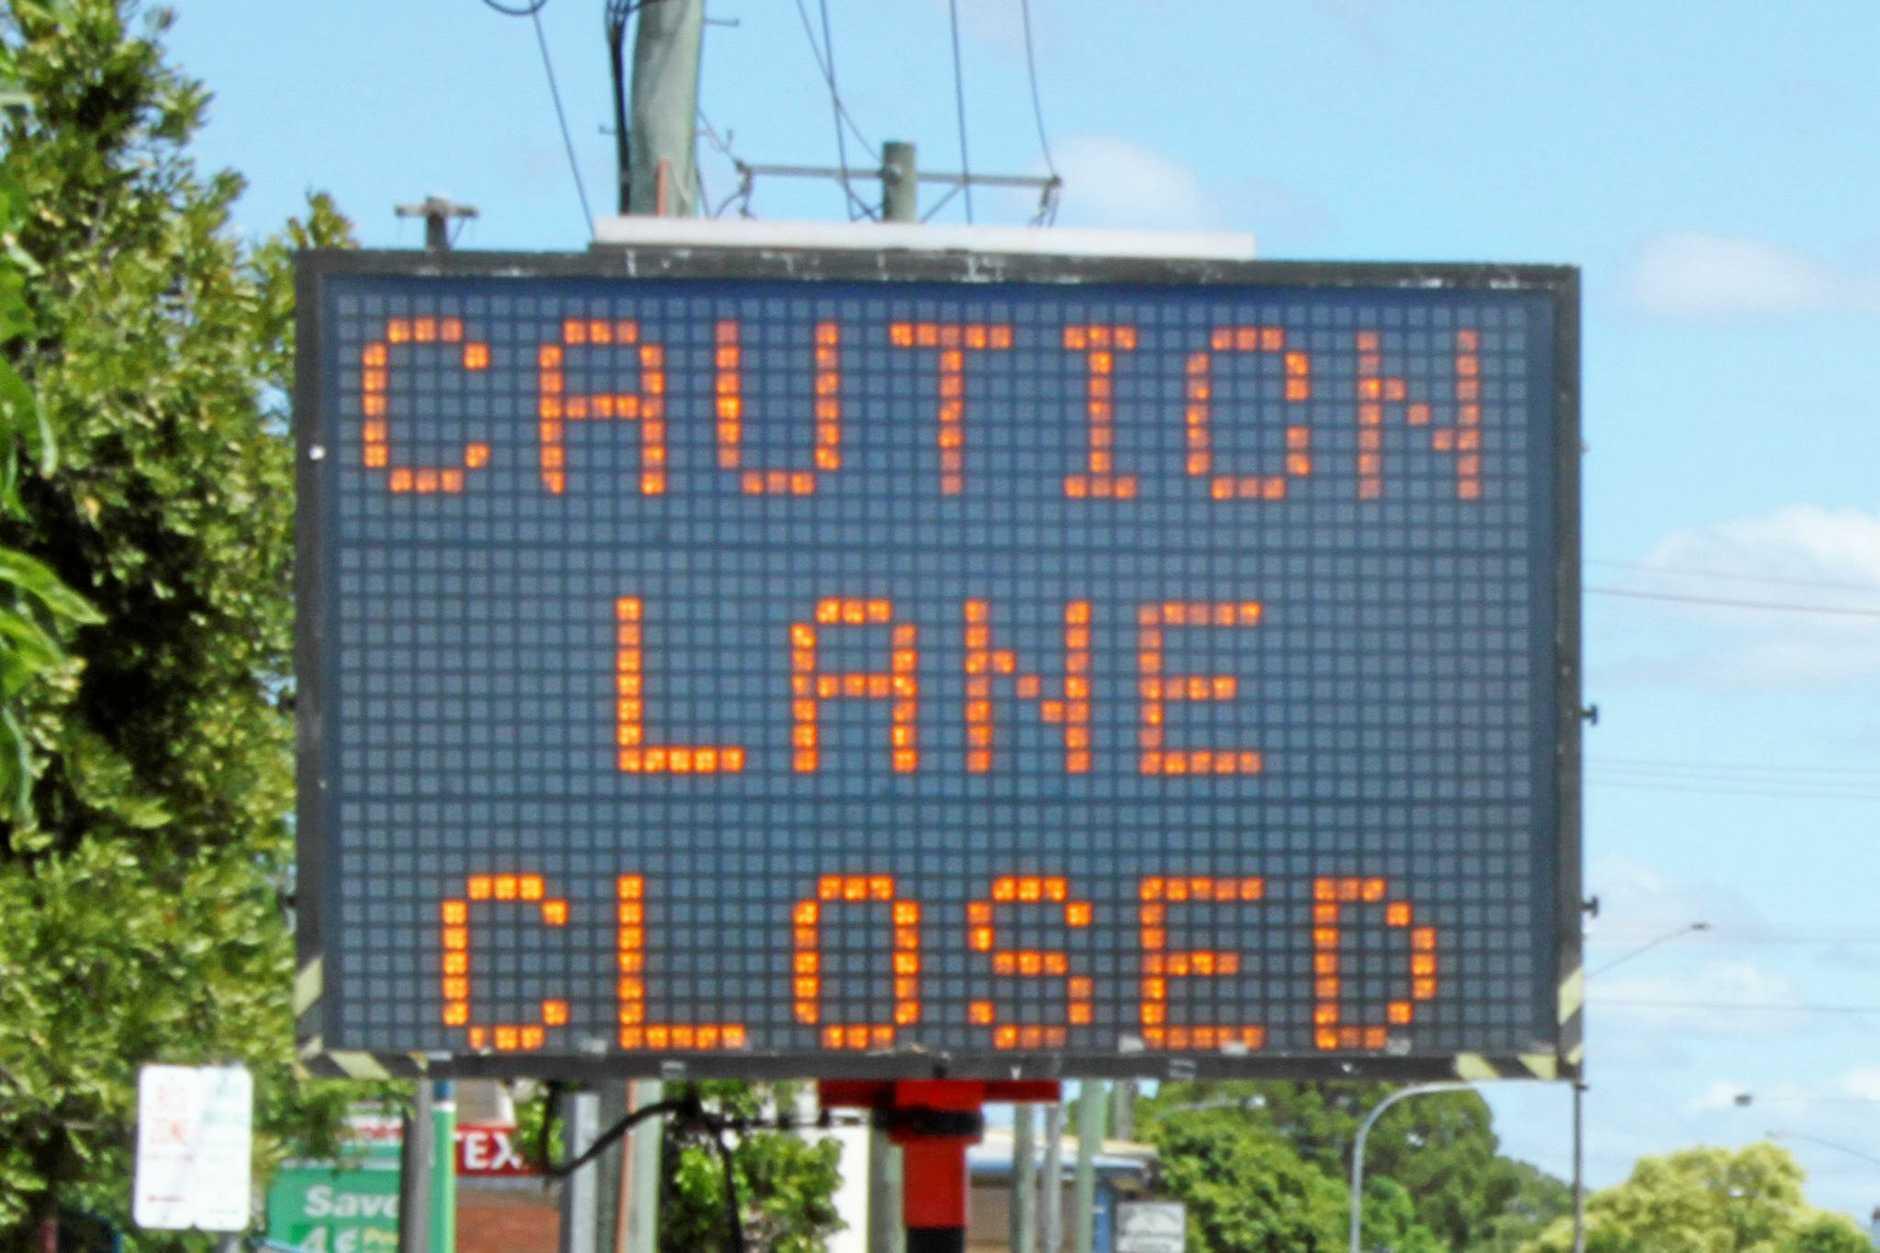 The lane closed sign on Fitzroy Street, Grafton. Photo: Jojo Newby / The Daily Examiner